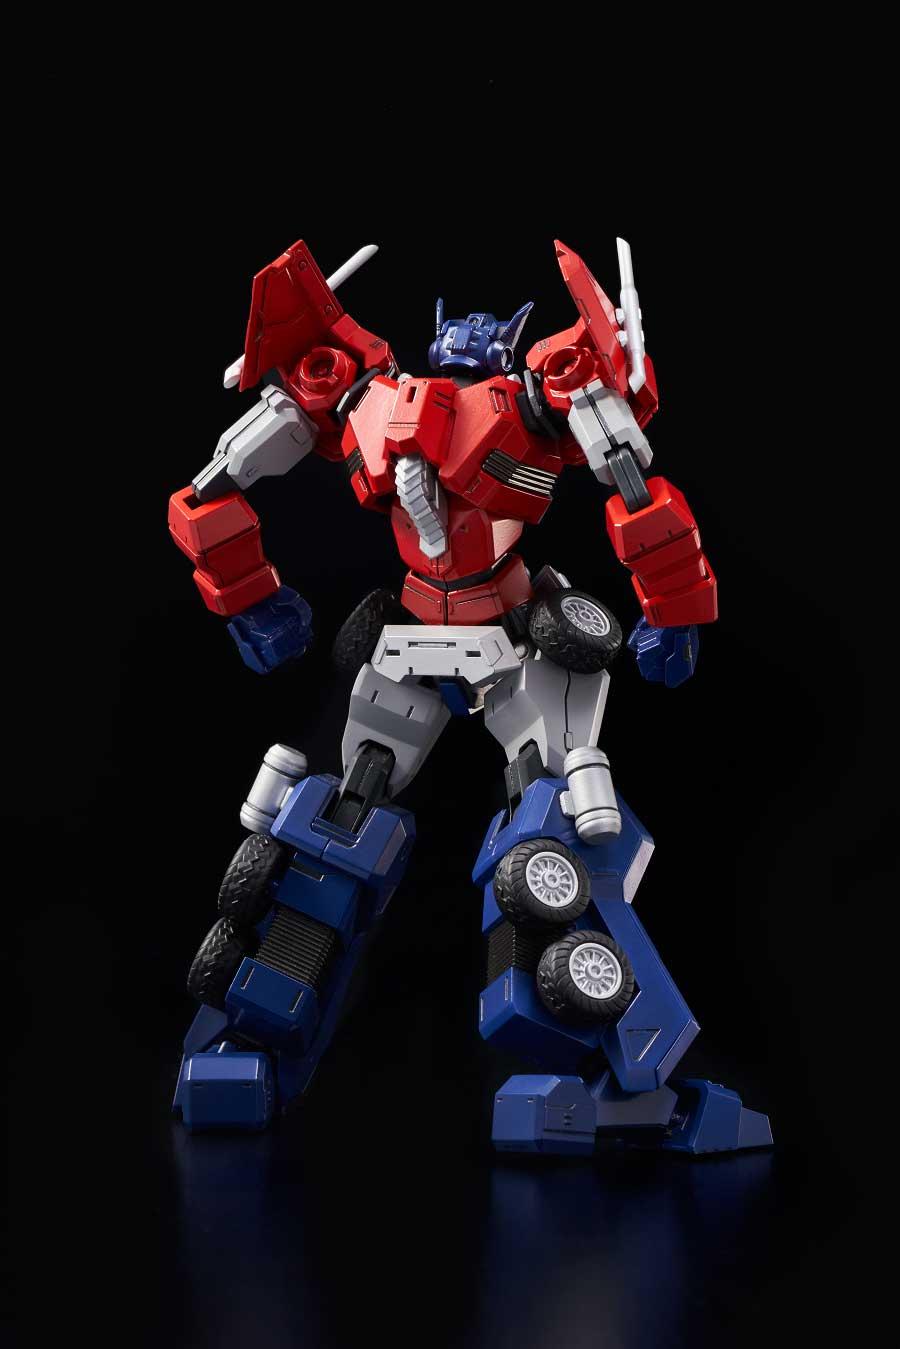 Flame Toys Furai Model 01 Optimus Prime Attack Mode Transformers